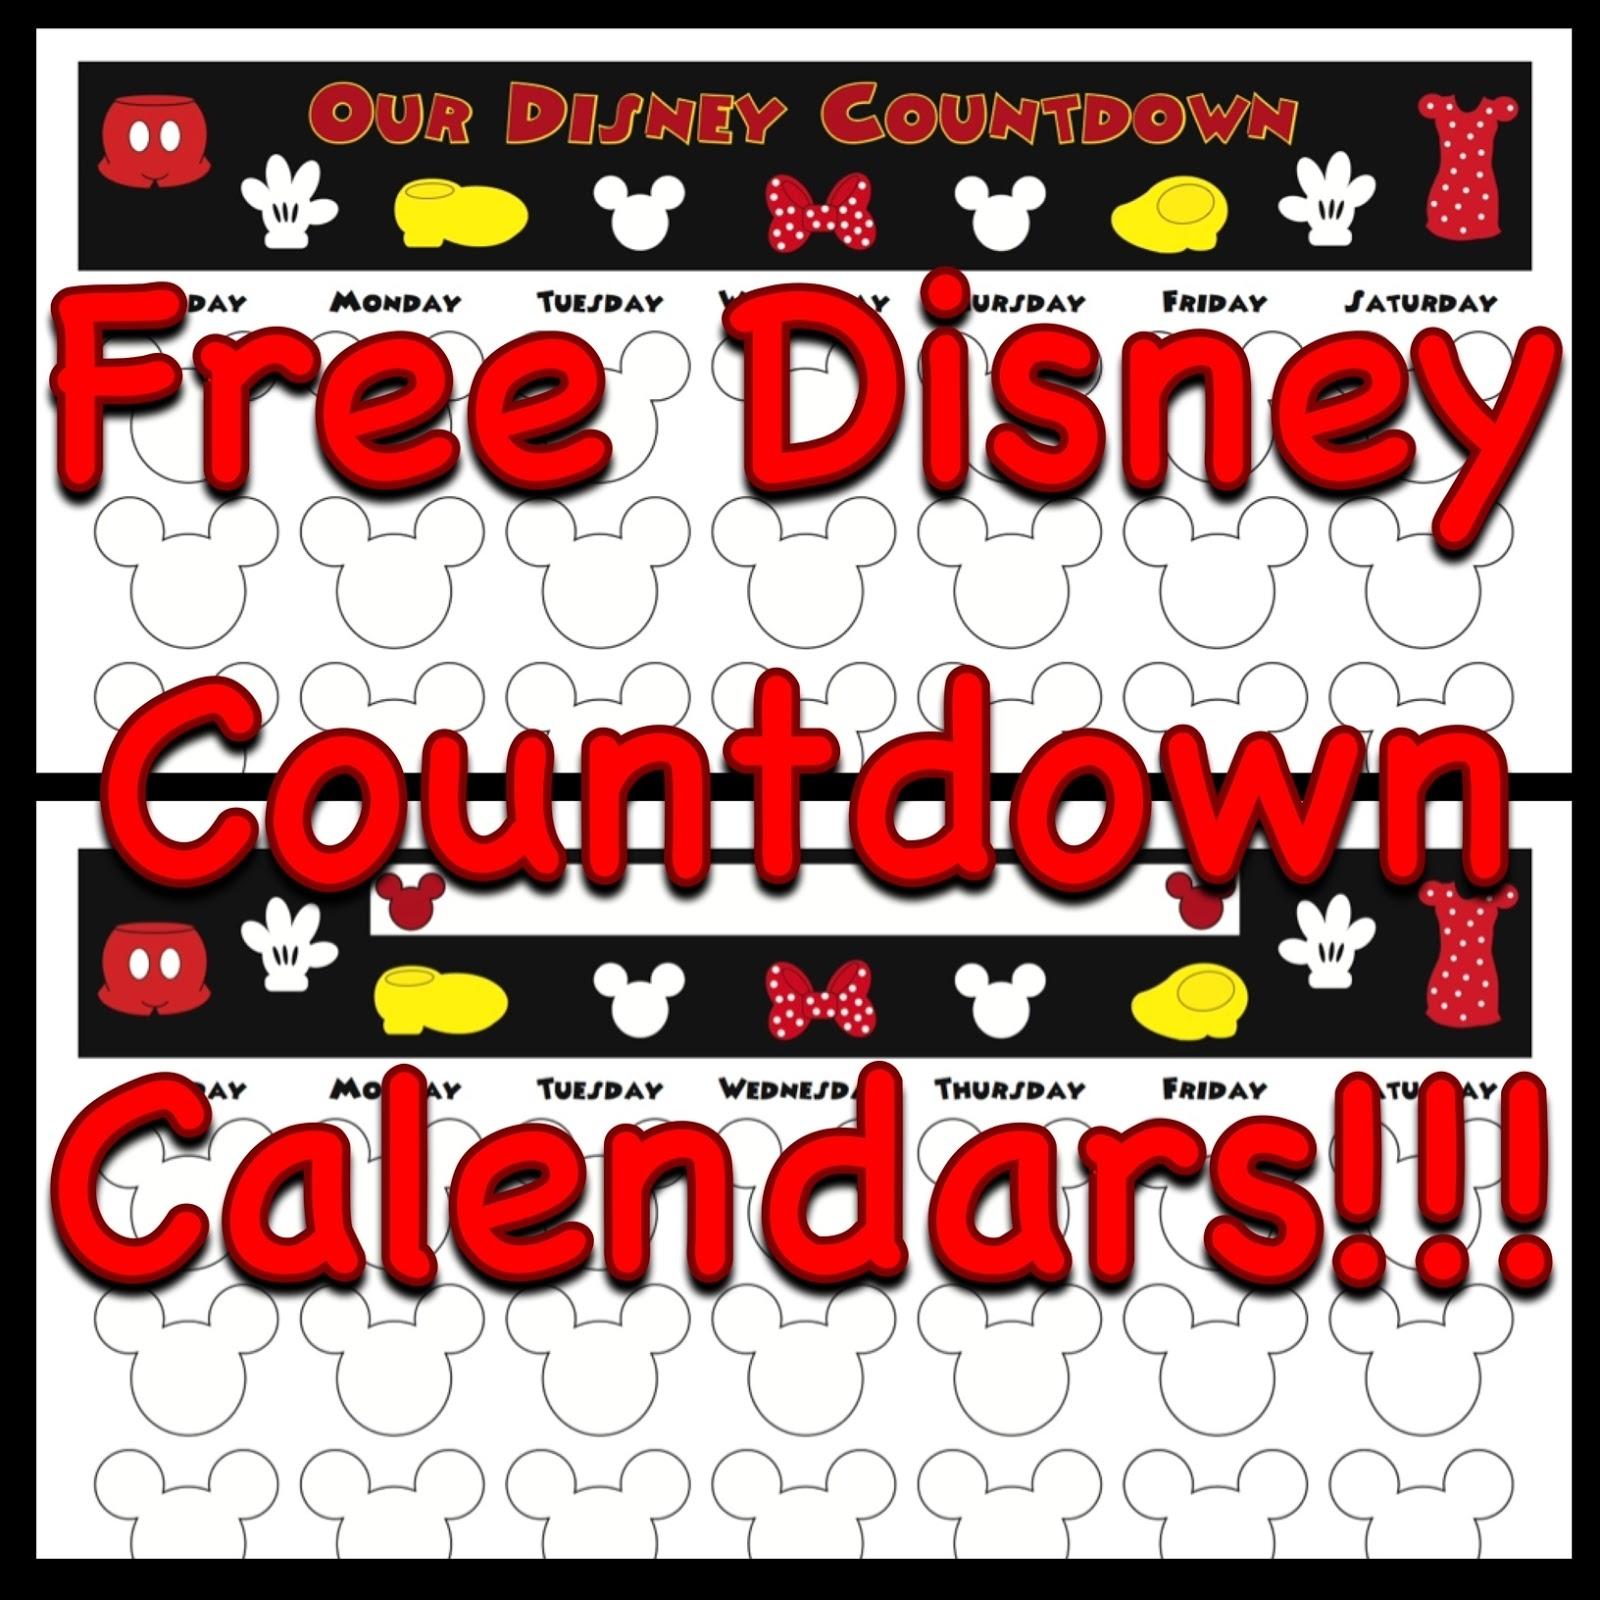 My Disney Life: Countdown Calendars with regard to Count Diwn Calendar Fir Disney Cruise